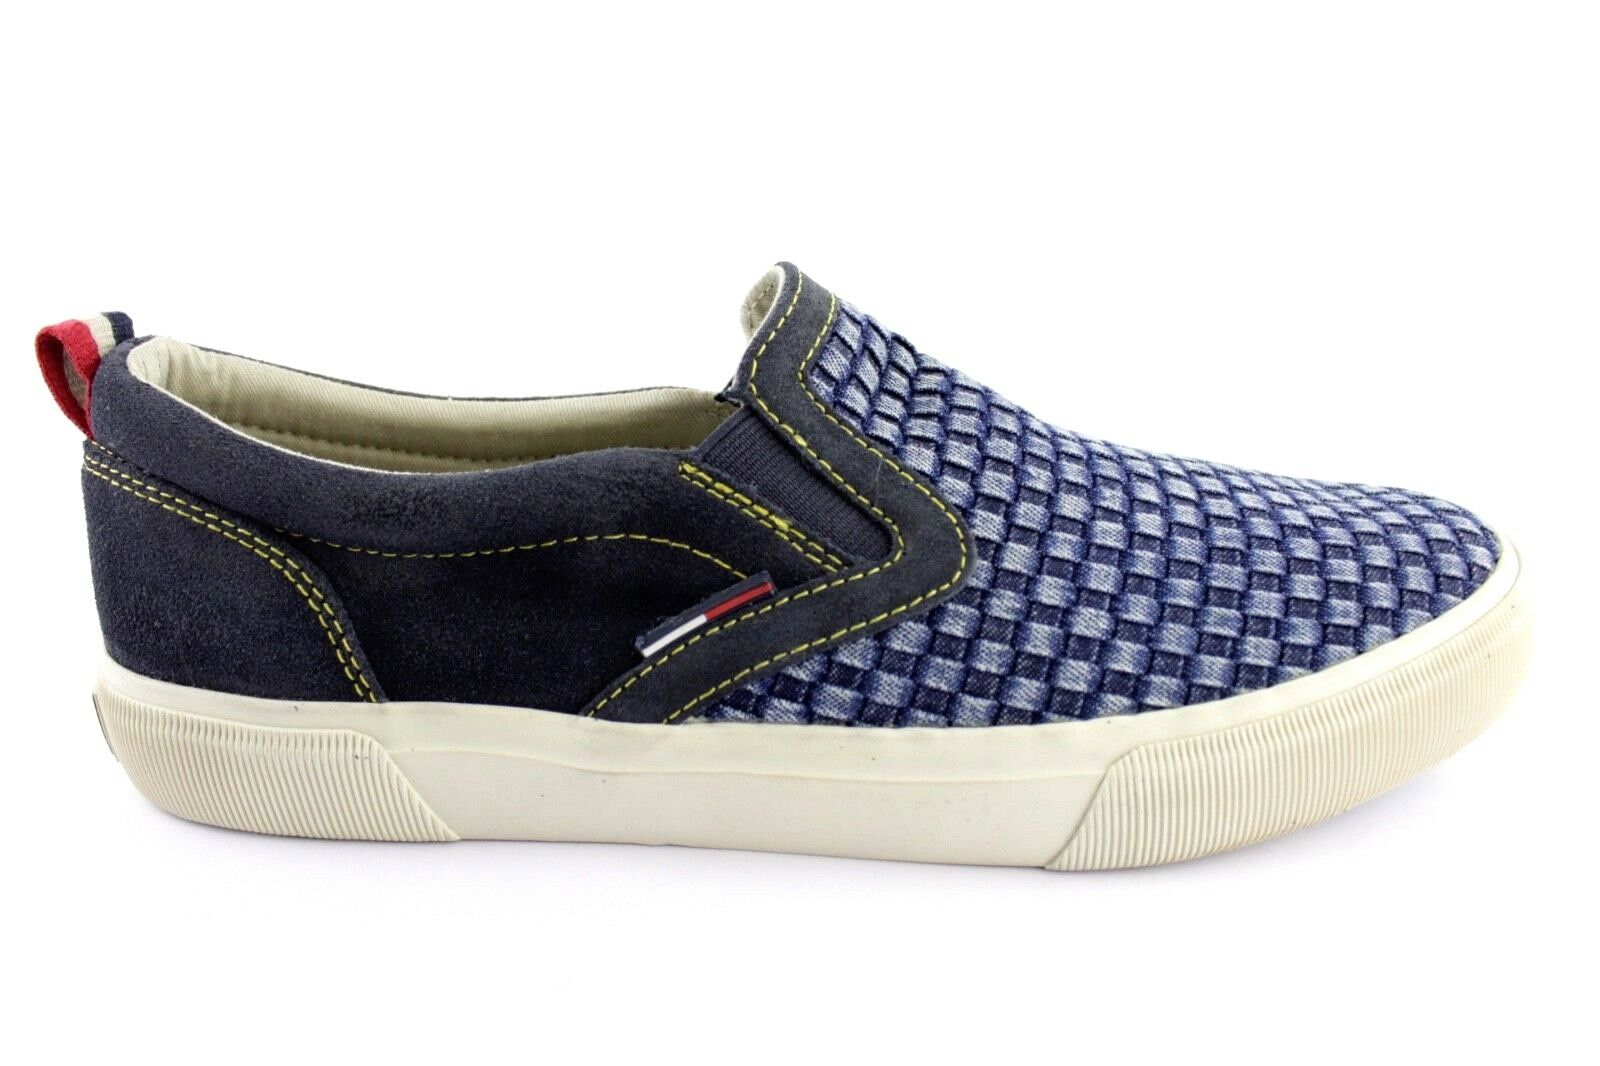 Tommy Halbschuhe Hilfiger Herren Slipper Sneaker Niedrig Halbschuhe Tommy Skaterschuhe Schuhe Gr. 42 4f6da3